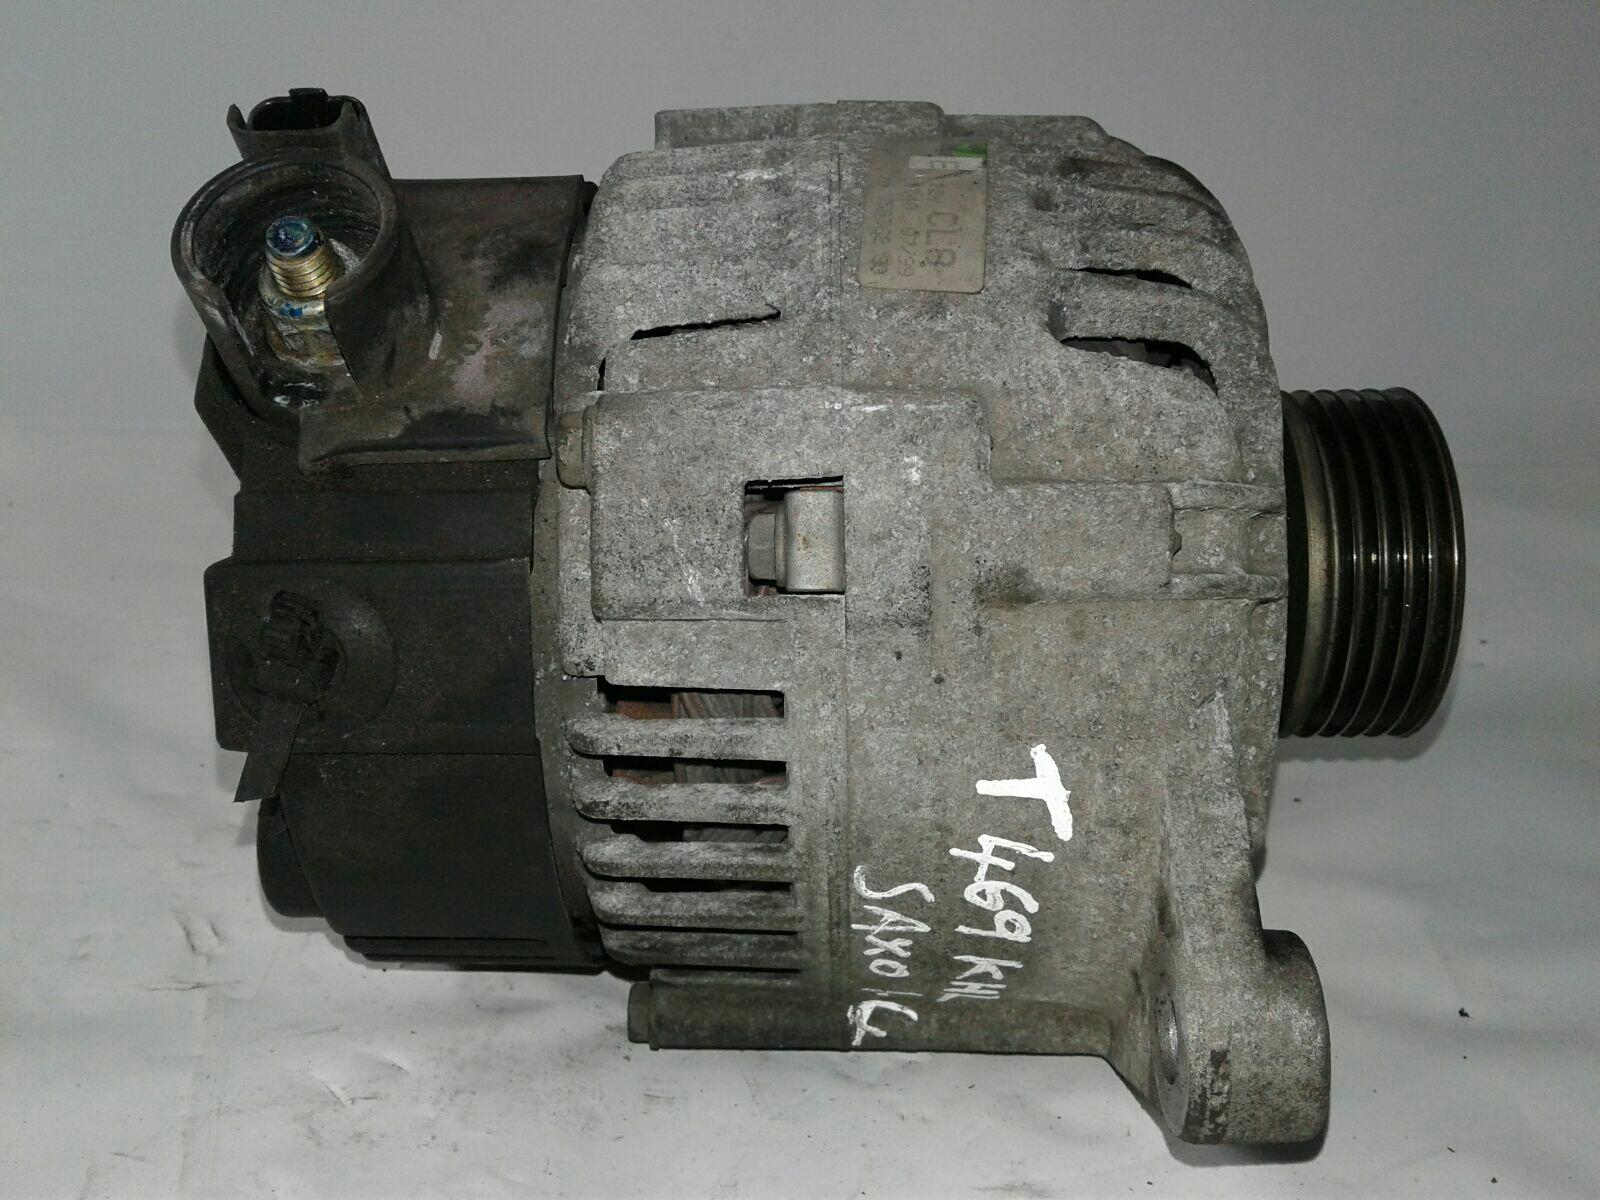 Saxo Alternator Wiring Diagram 4k Portal Citroen Ax Fuse Box 1996 To 1999 Sx Petrol Tu3jp Kfx U0026 Warranty 5222195